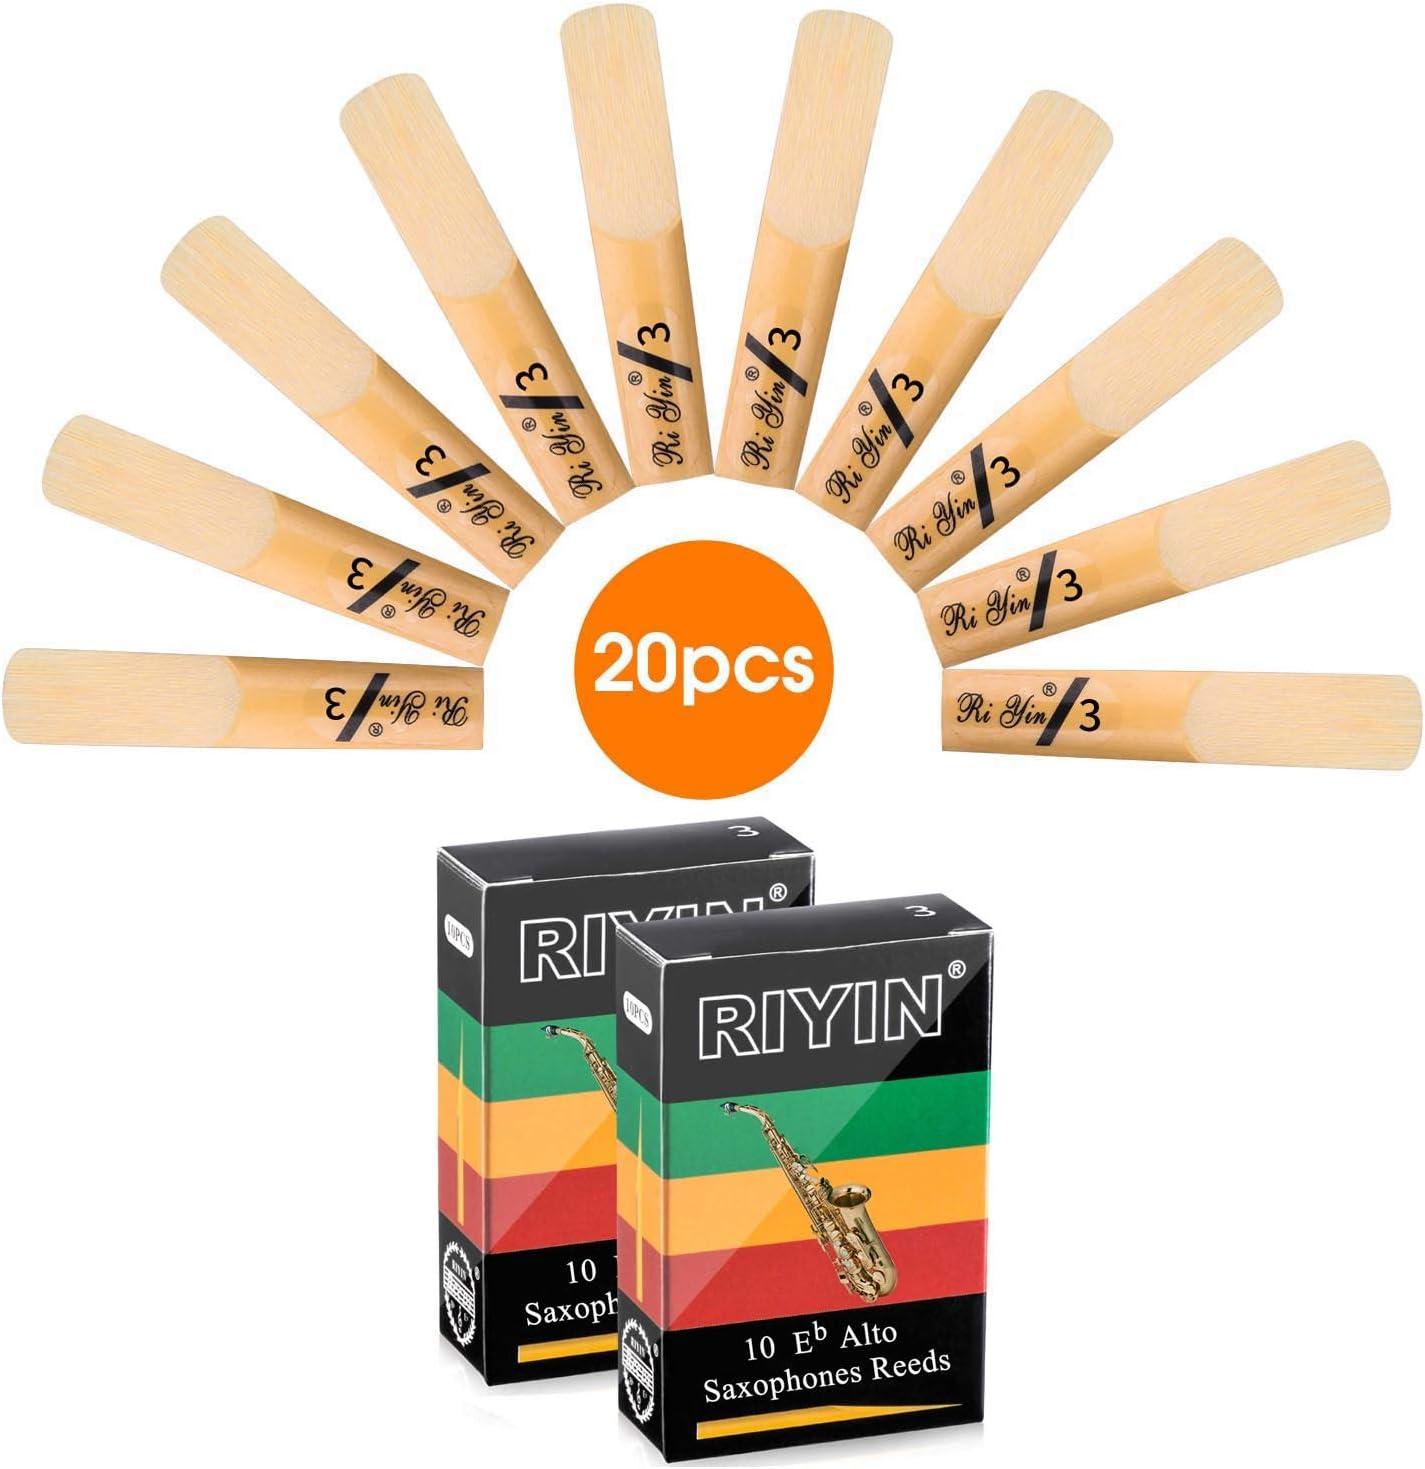 20pcs Alto Saxophone Reeds 3.0 Size 3 Alto Sax Reeds Strength 2.5 3.0 Optional (3.0, 20 Packs) 71ak6dvra4L